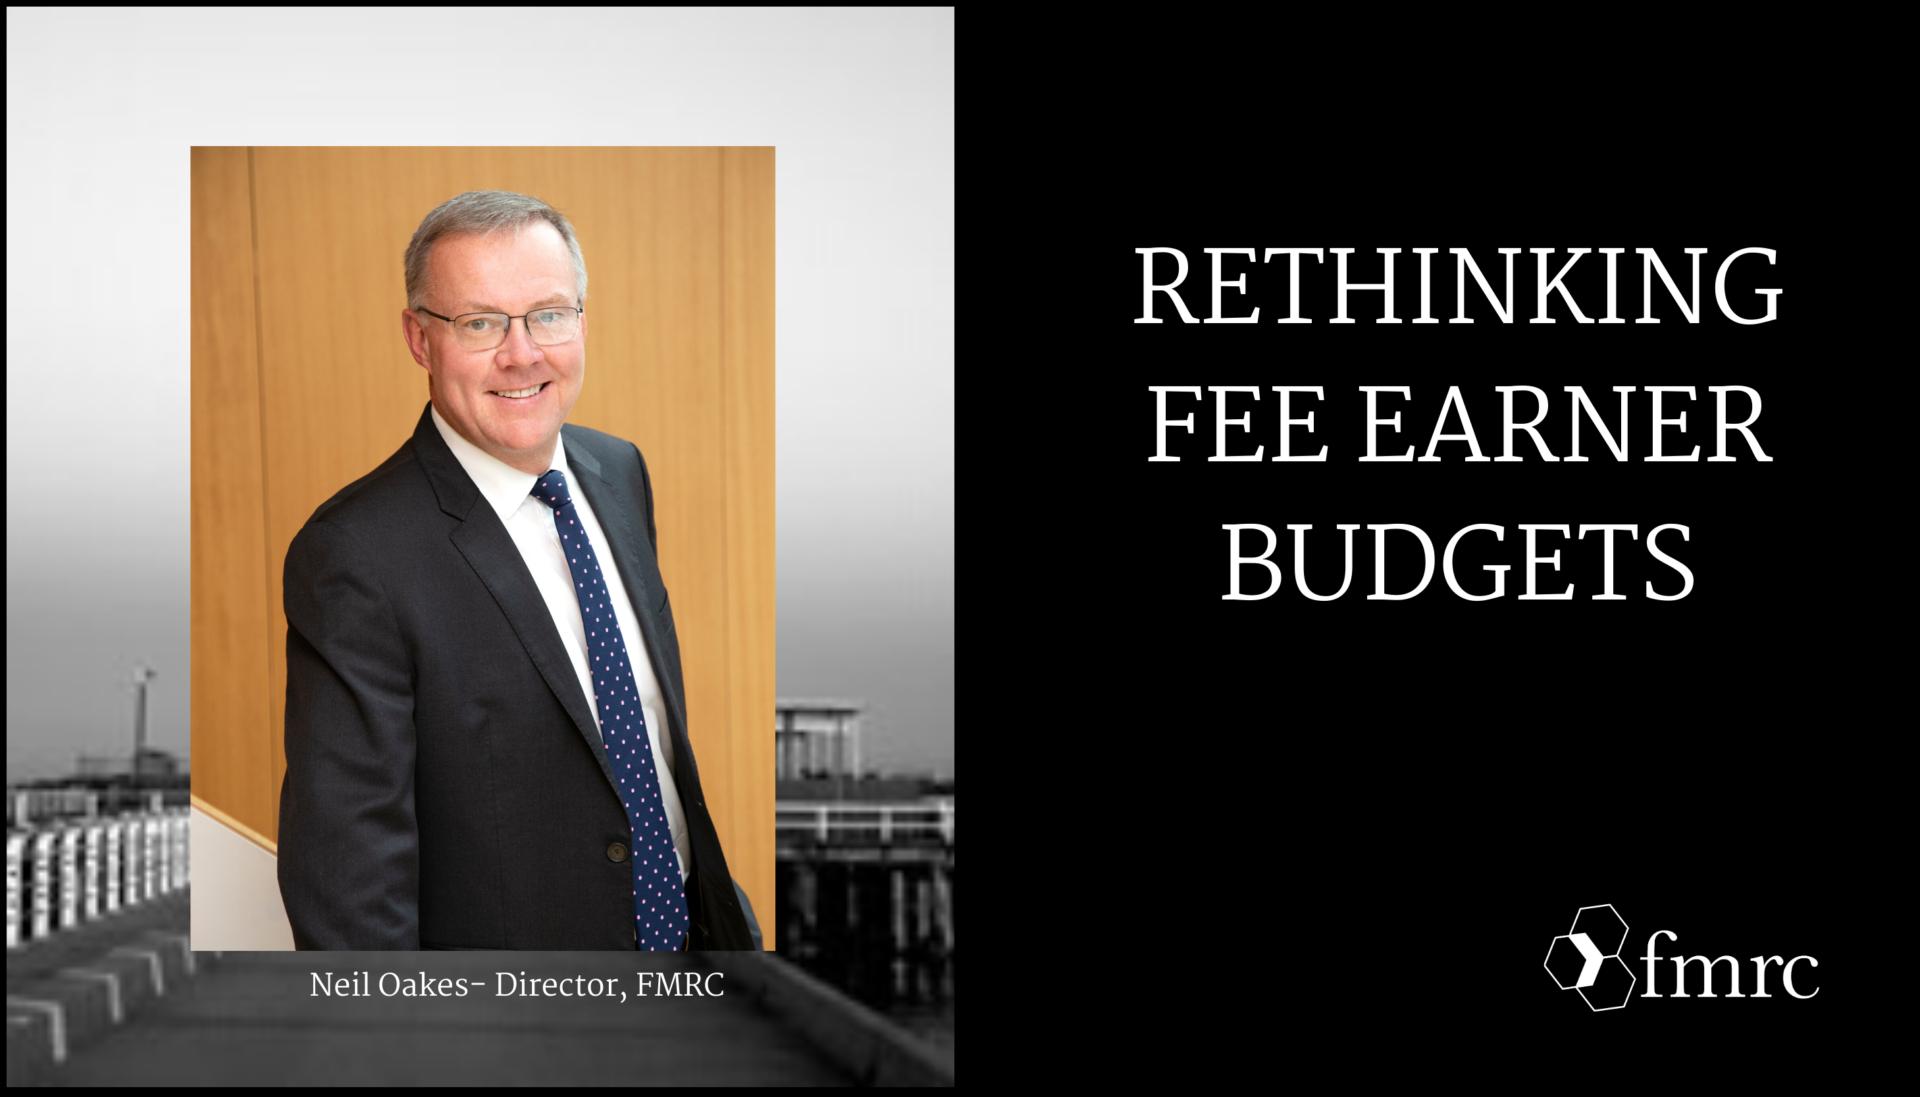 Rethinking Fee Earner Budgets